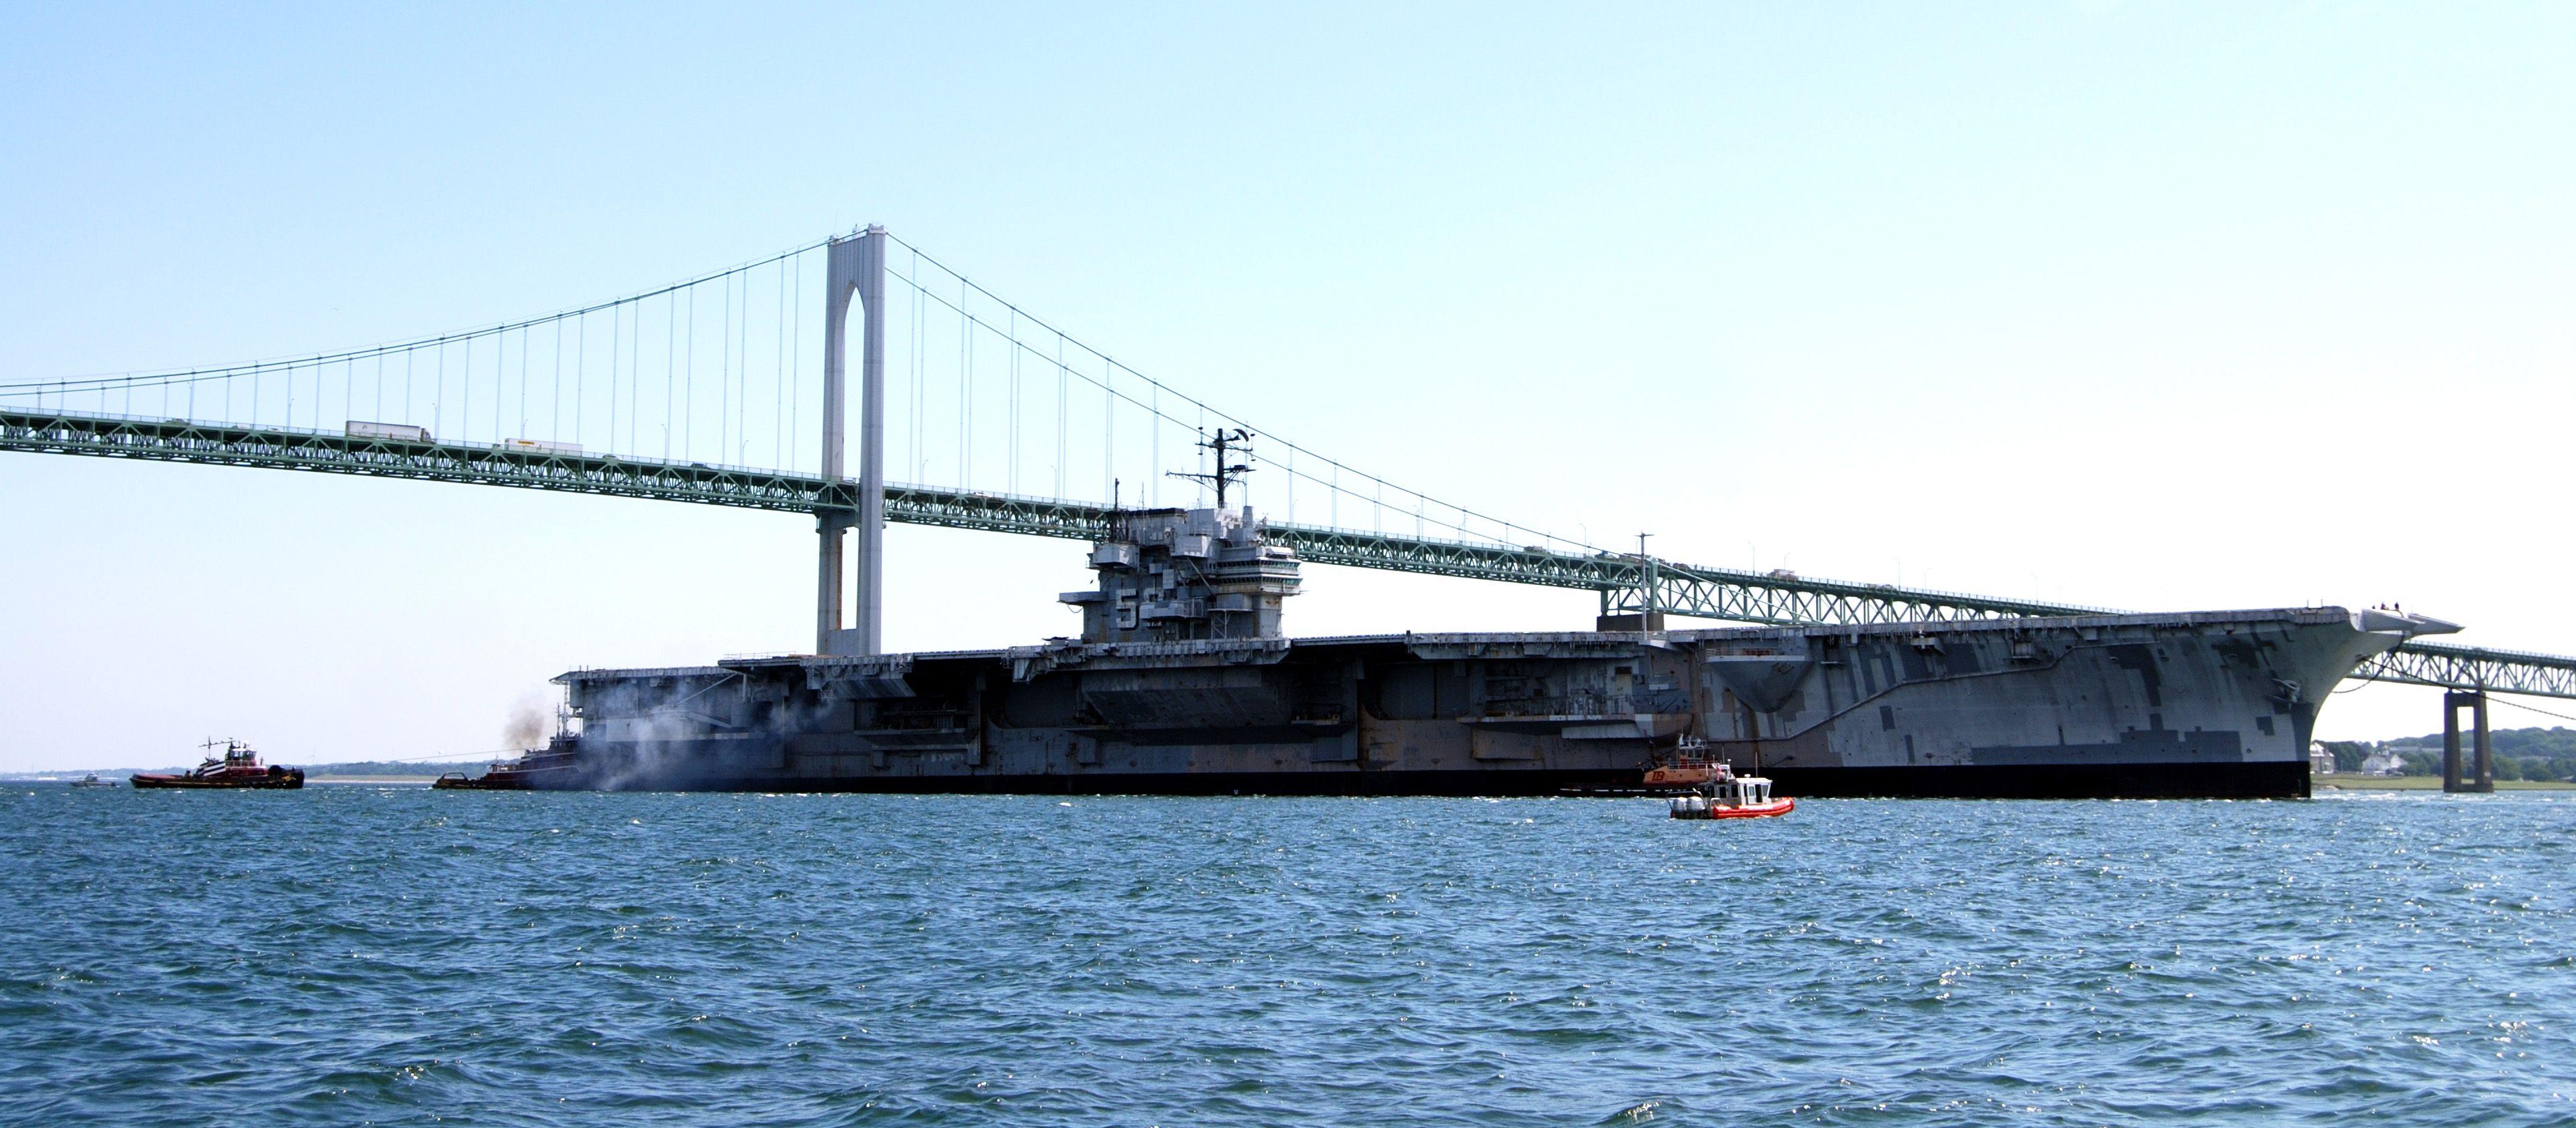 Looks like Yorktown class carrier in San Francisco harbor